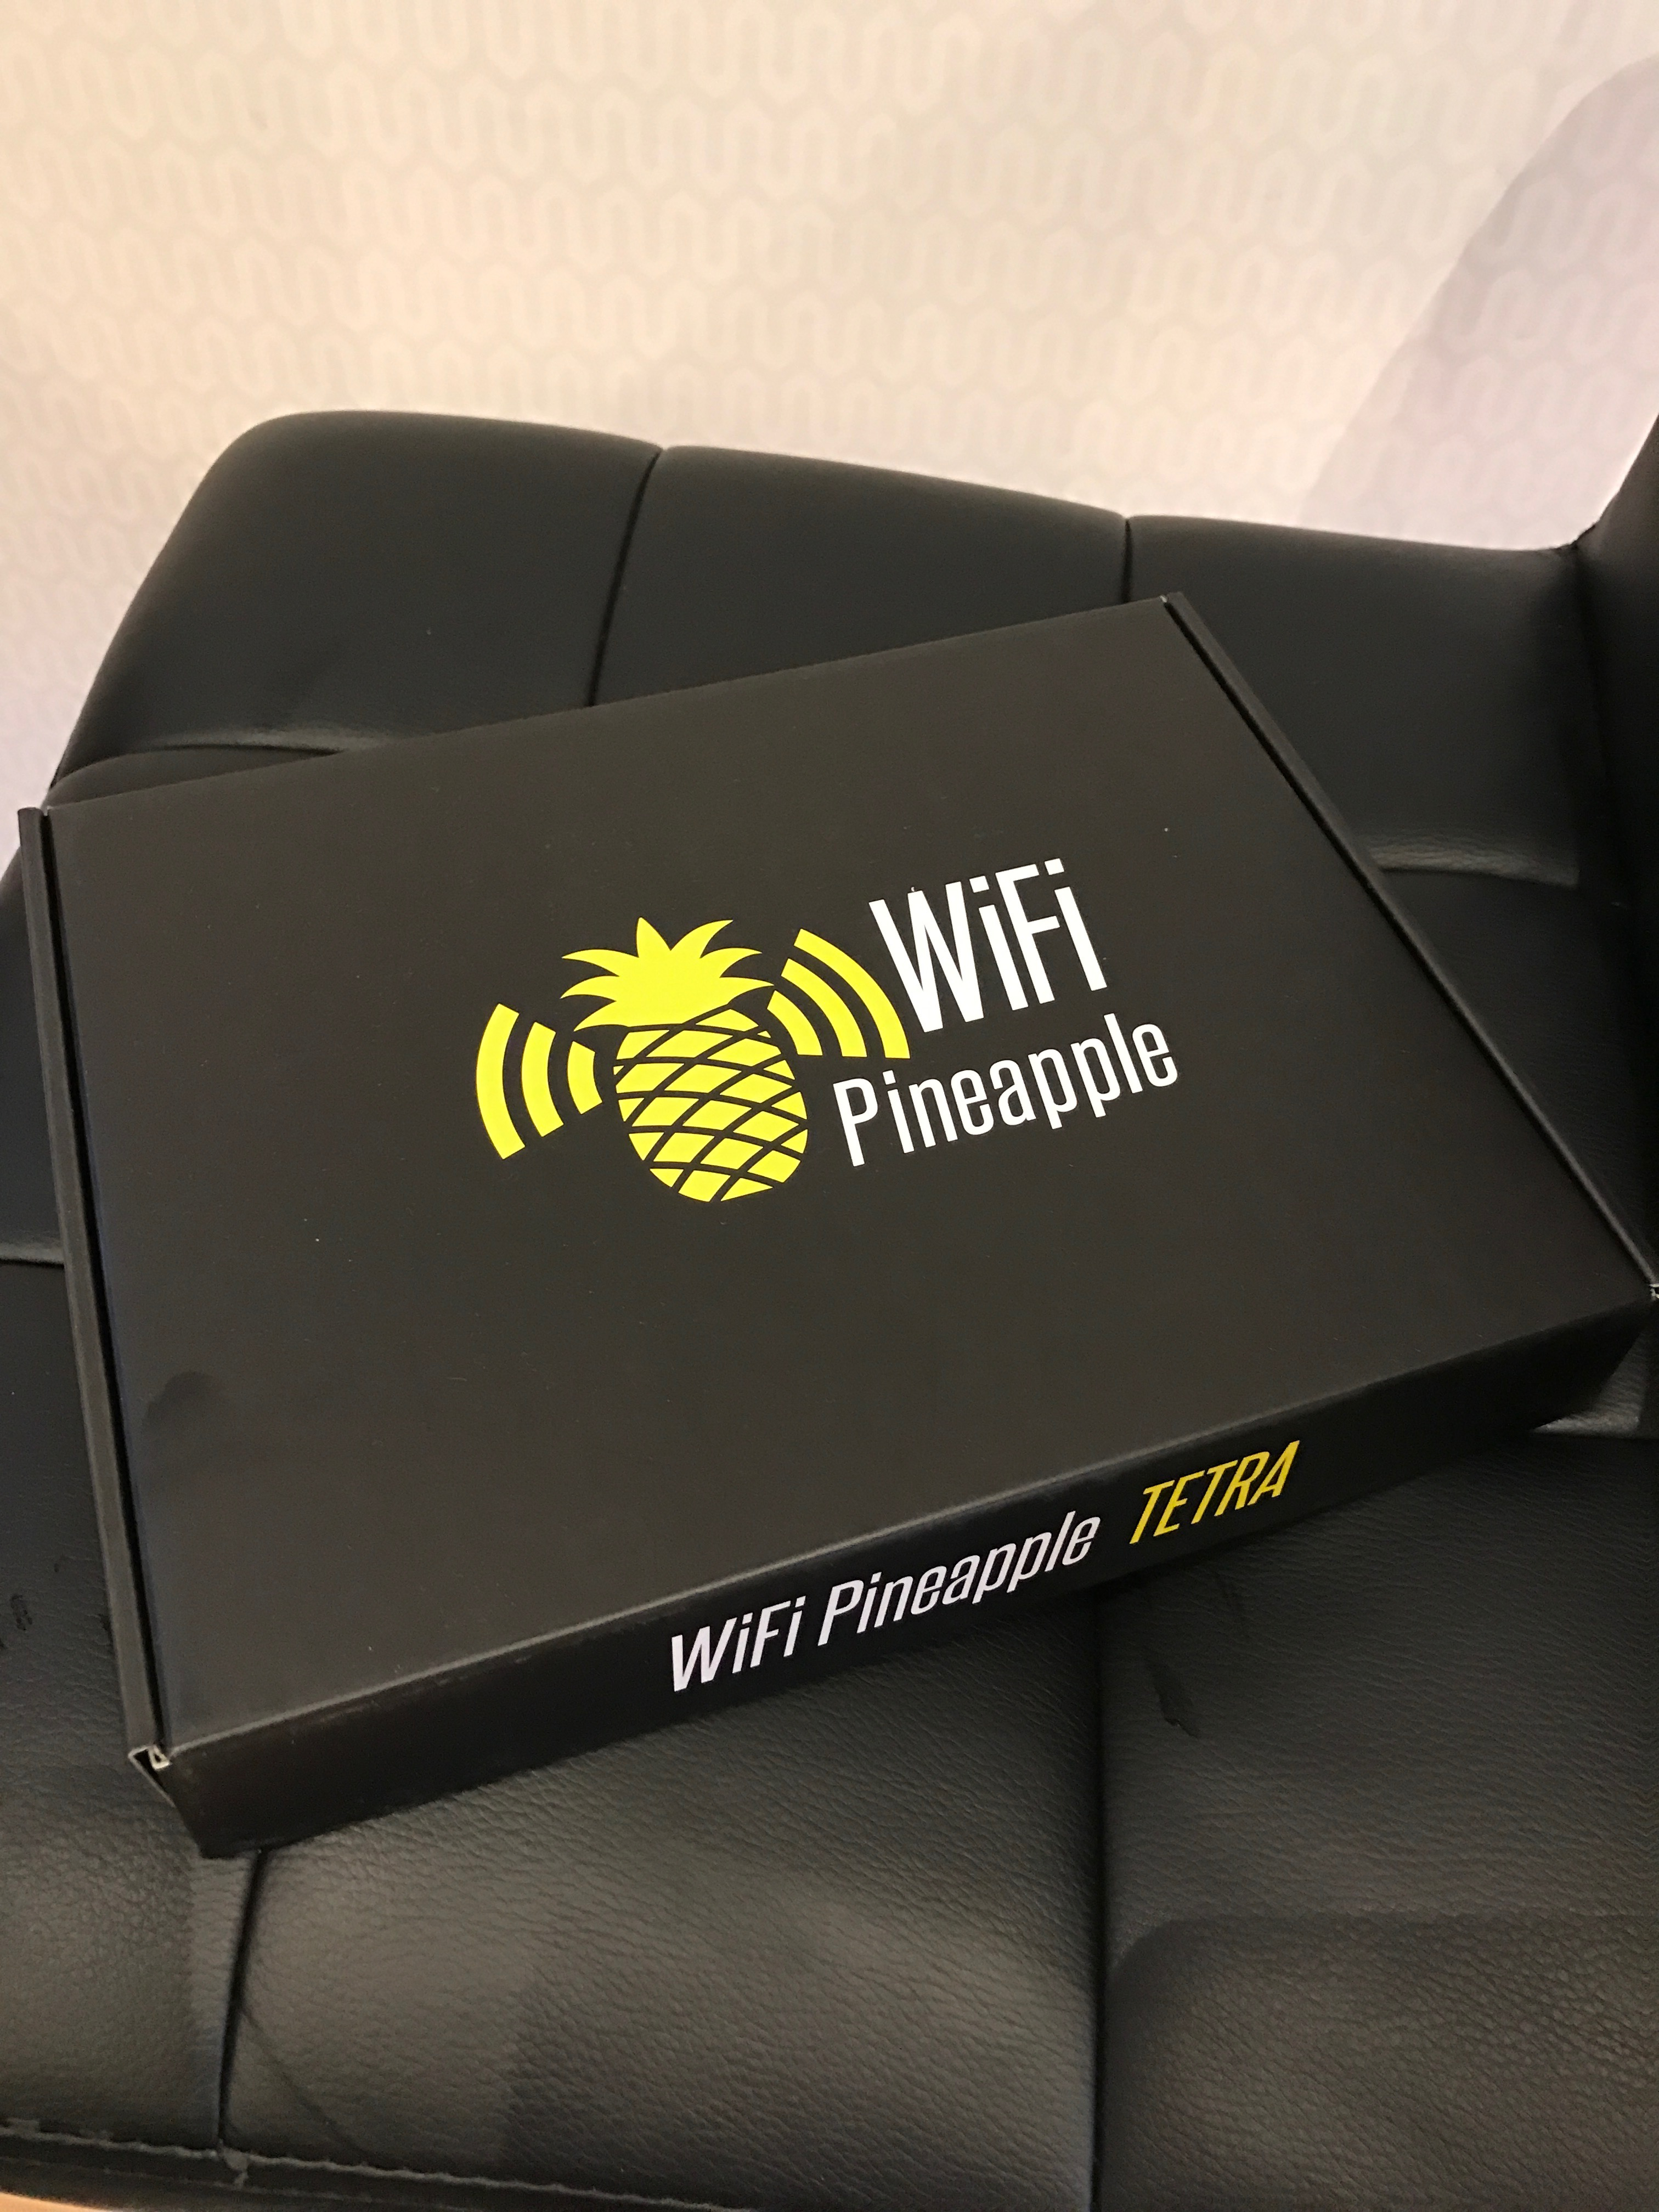 WiFi Pineapple box